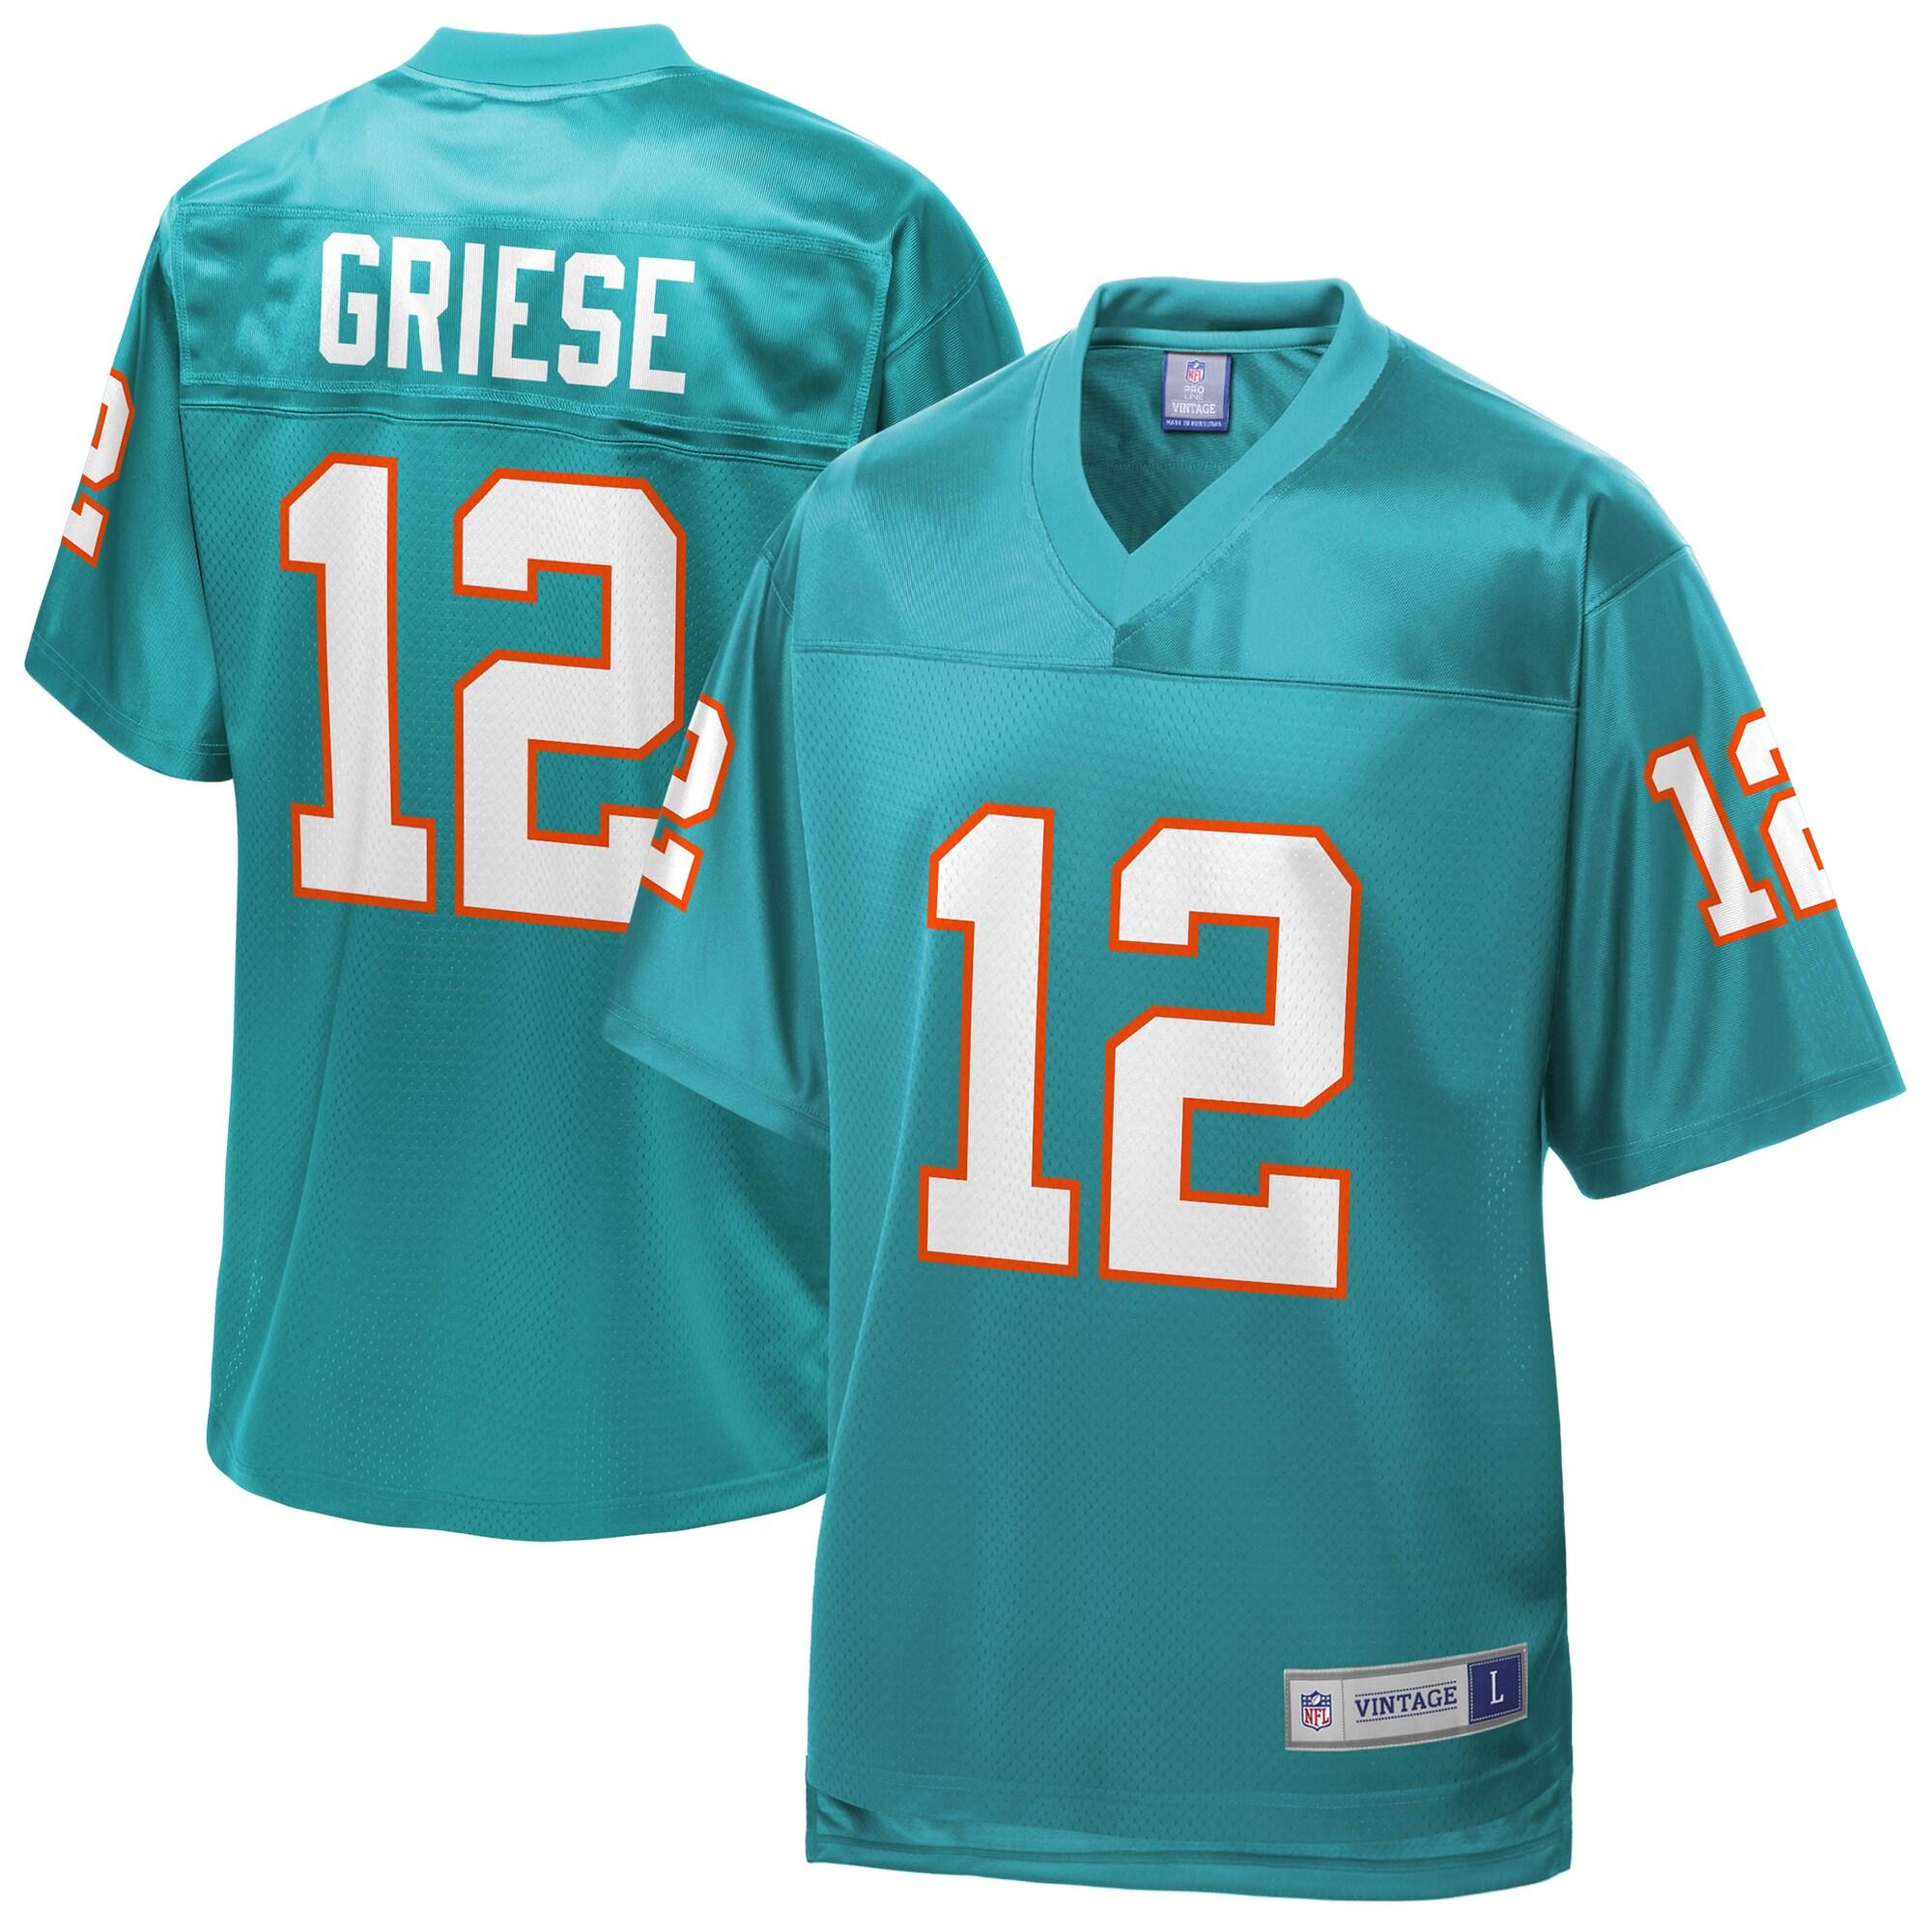 Bob Griese Miami Dolphins NFL Pro Line Retired Player Replica Jersey - Aqua